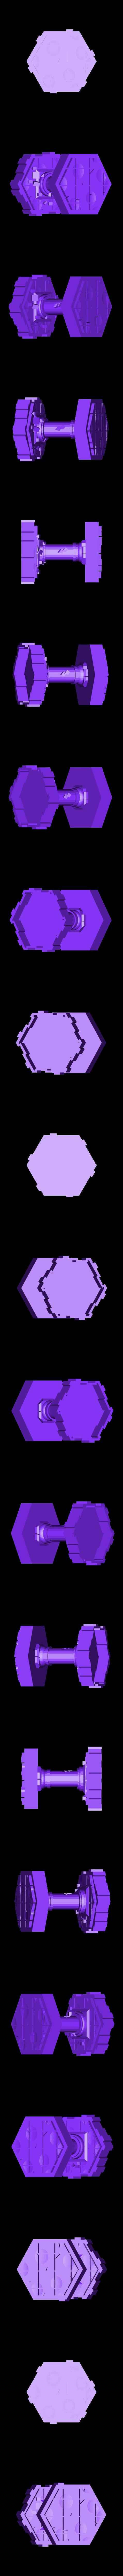 Hex_Pillar_Rins_wiht_Top_Together.stl Download free STL file Locking Hex Stone Pillars • 3D printable design, mrhers2